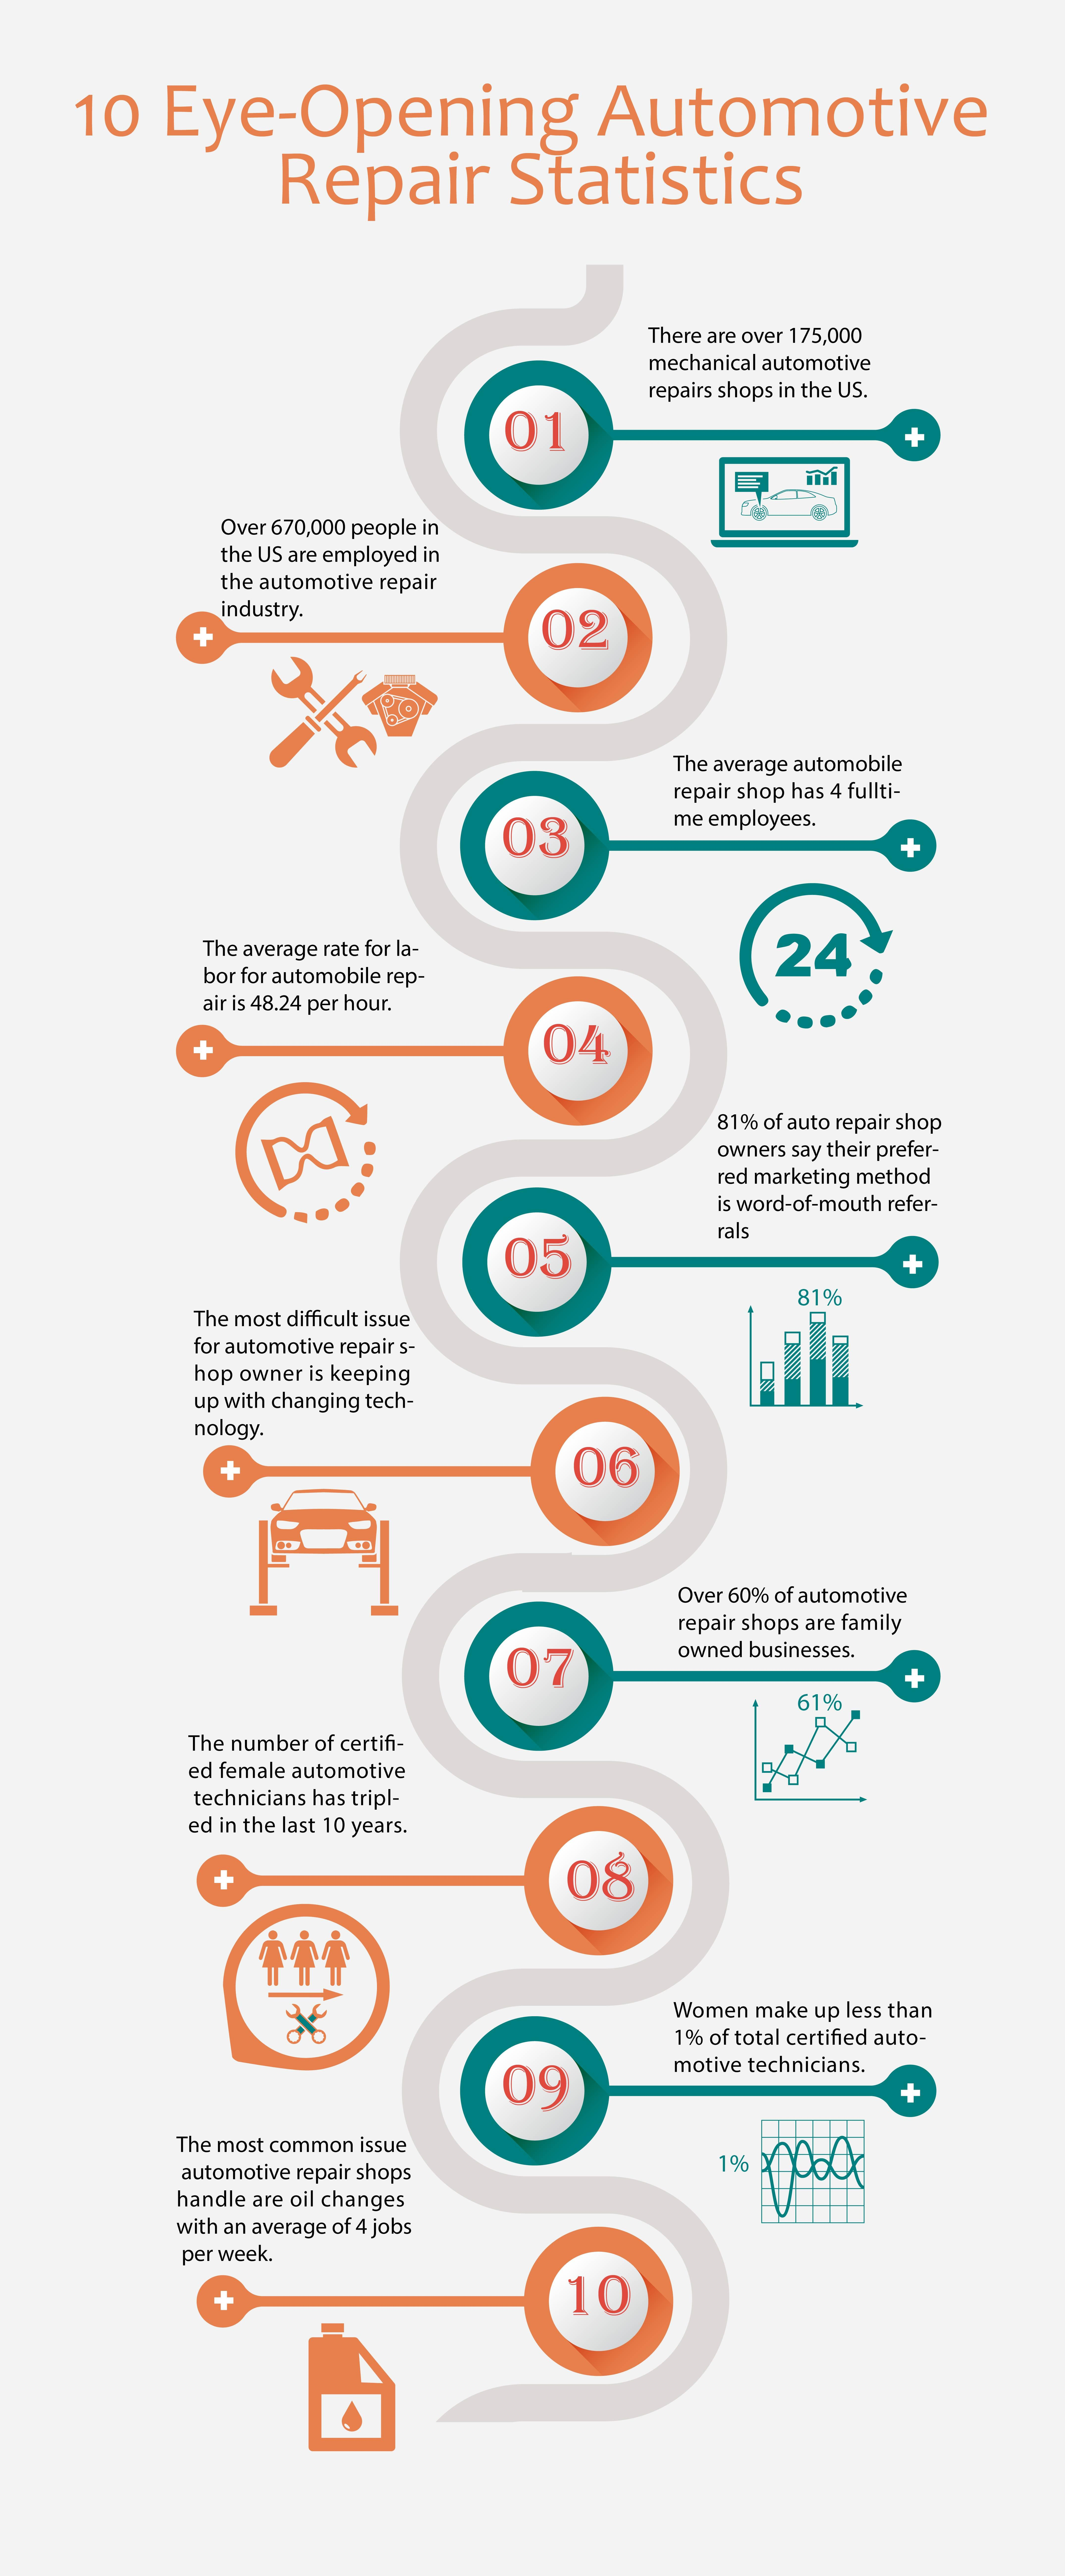 10 Eye-Opening Automotive Repair Statistics